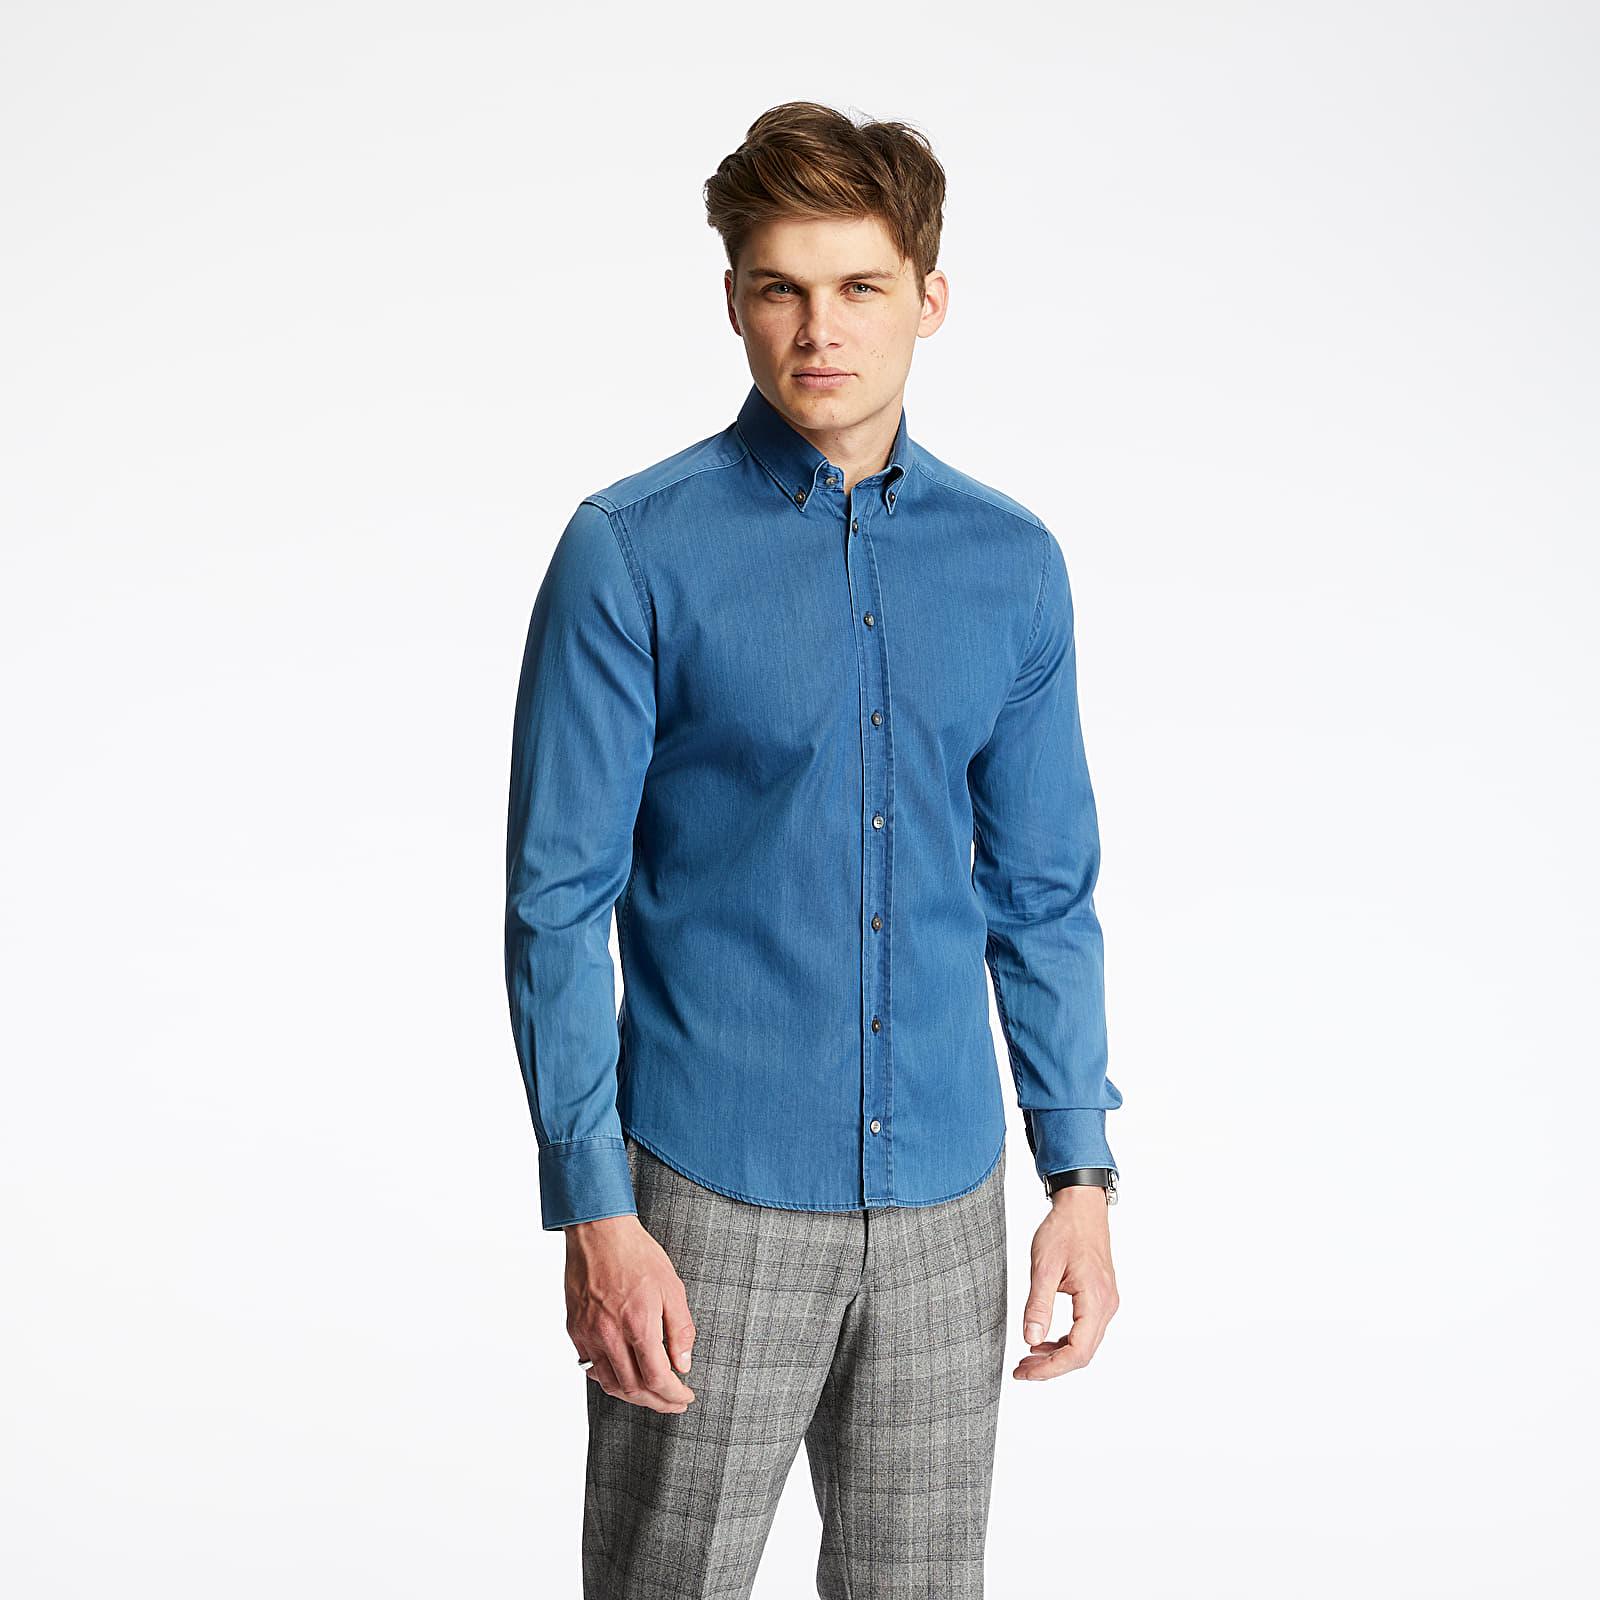 Košile Pietro Filipi Men's Denim Shirt Blue